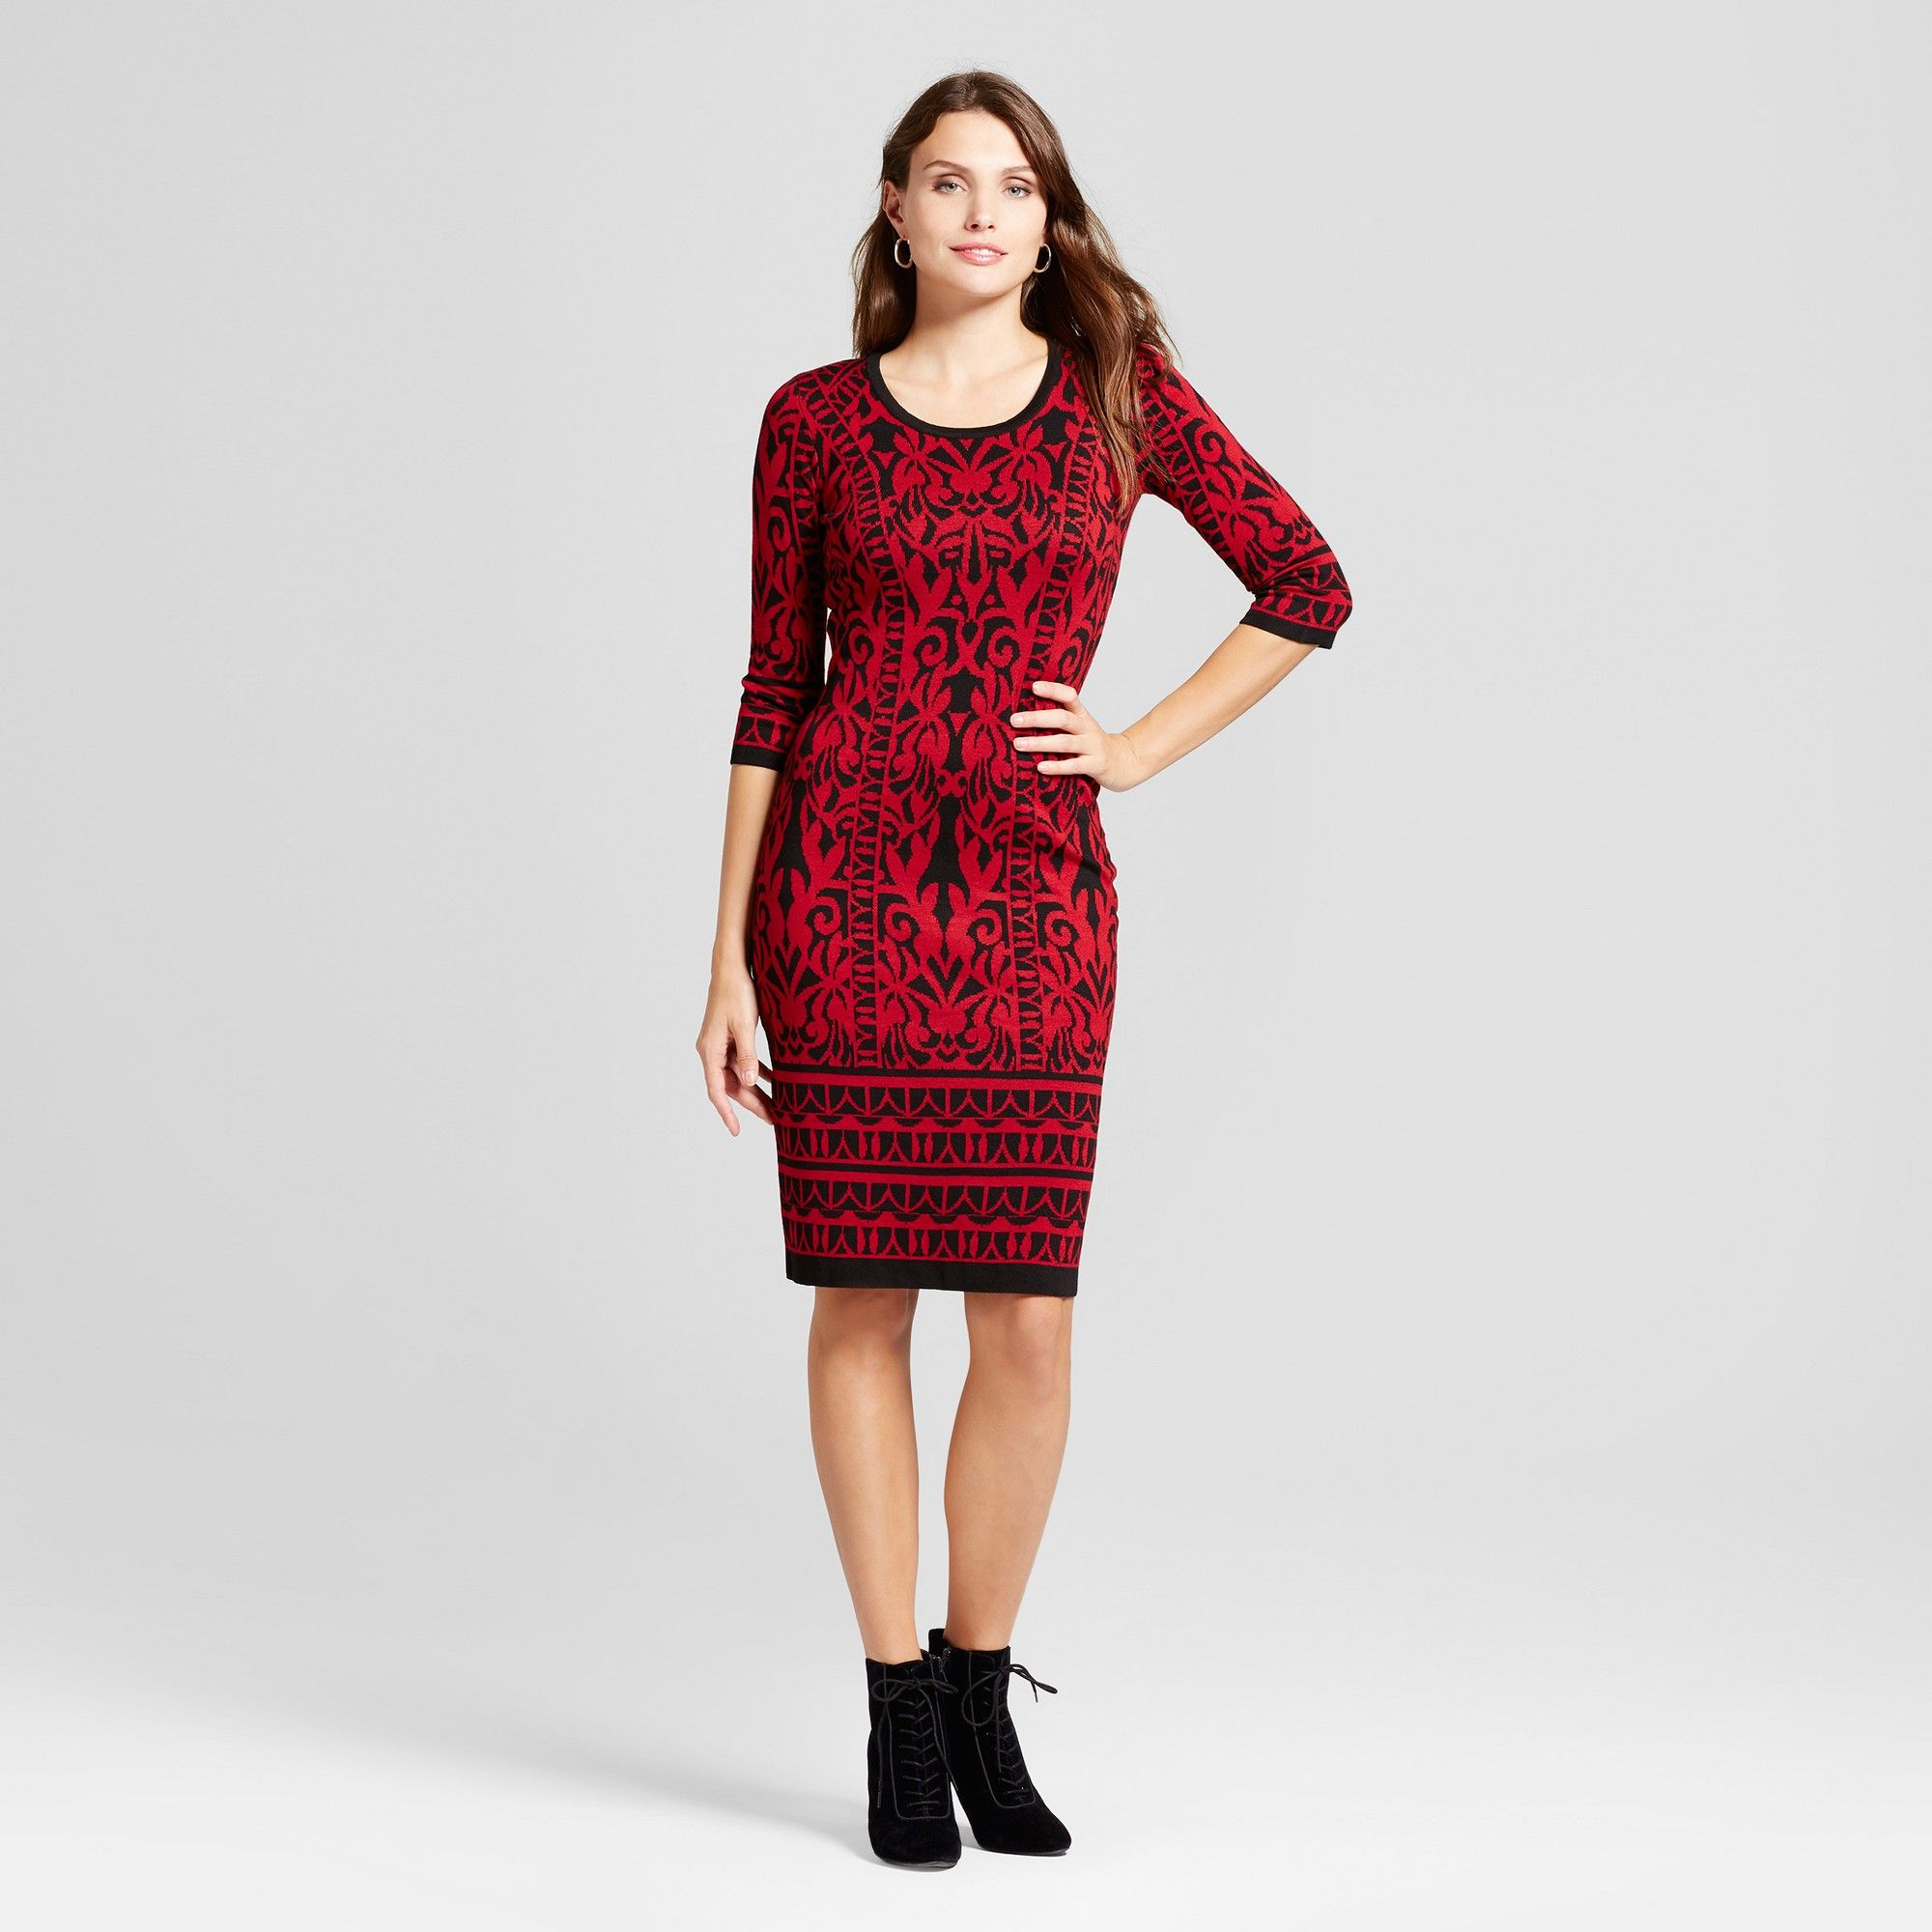 b23e7b5e06 Women s Scroll Printed Sheath Sweater Dress - Melonie T Red Black S ...